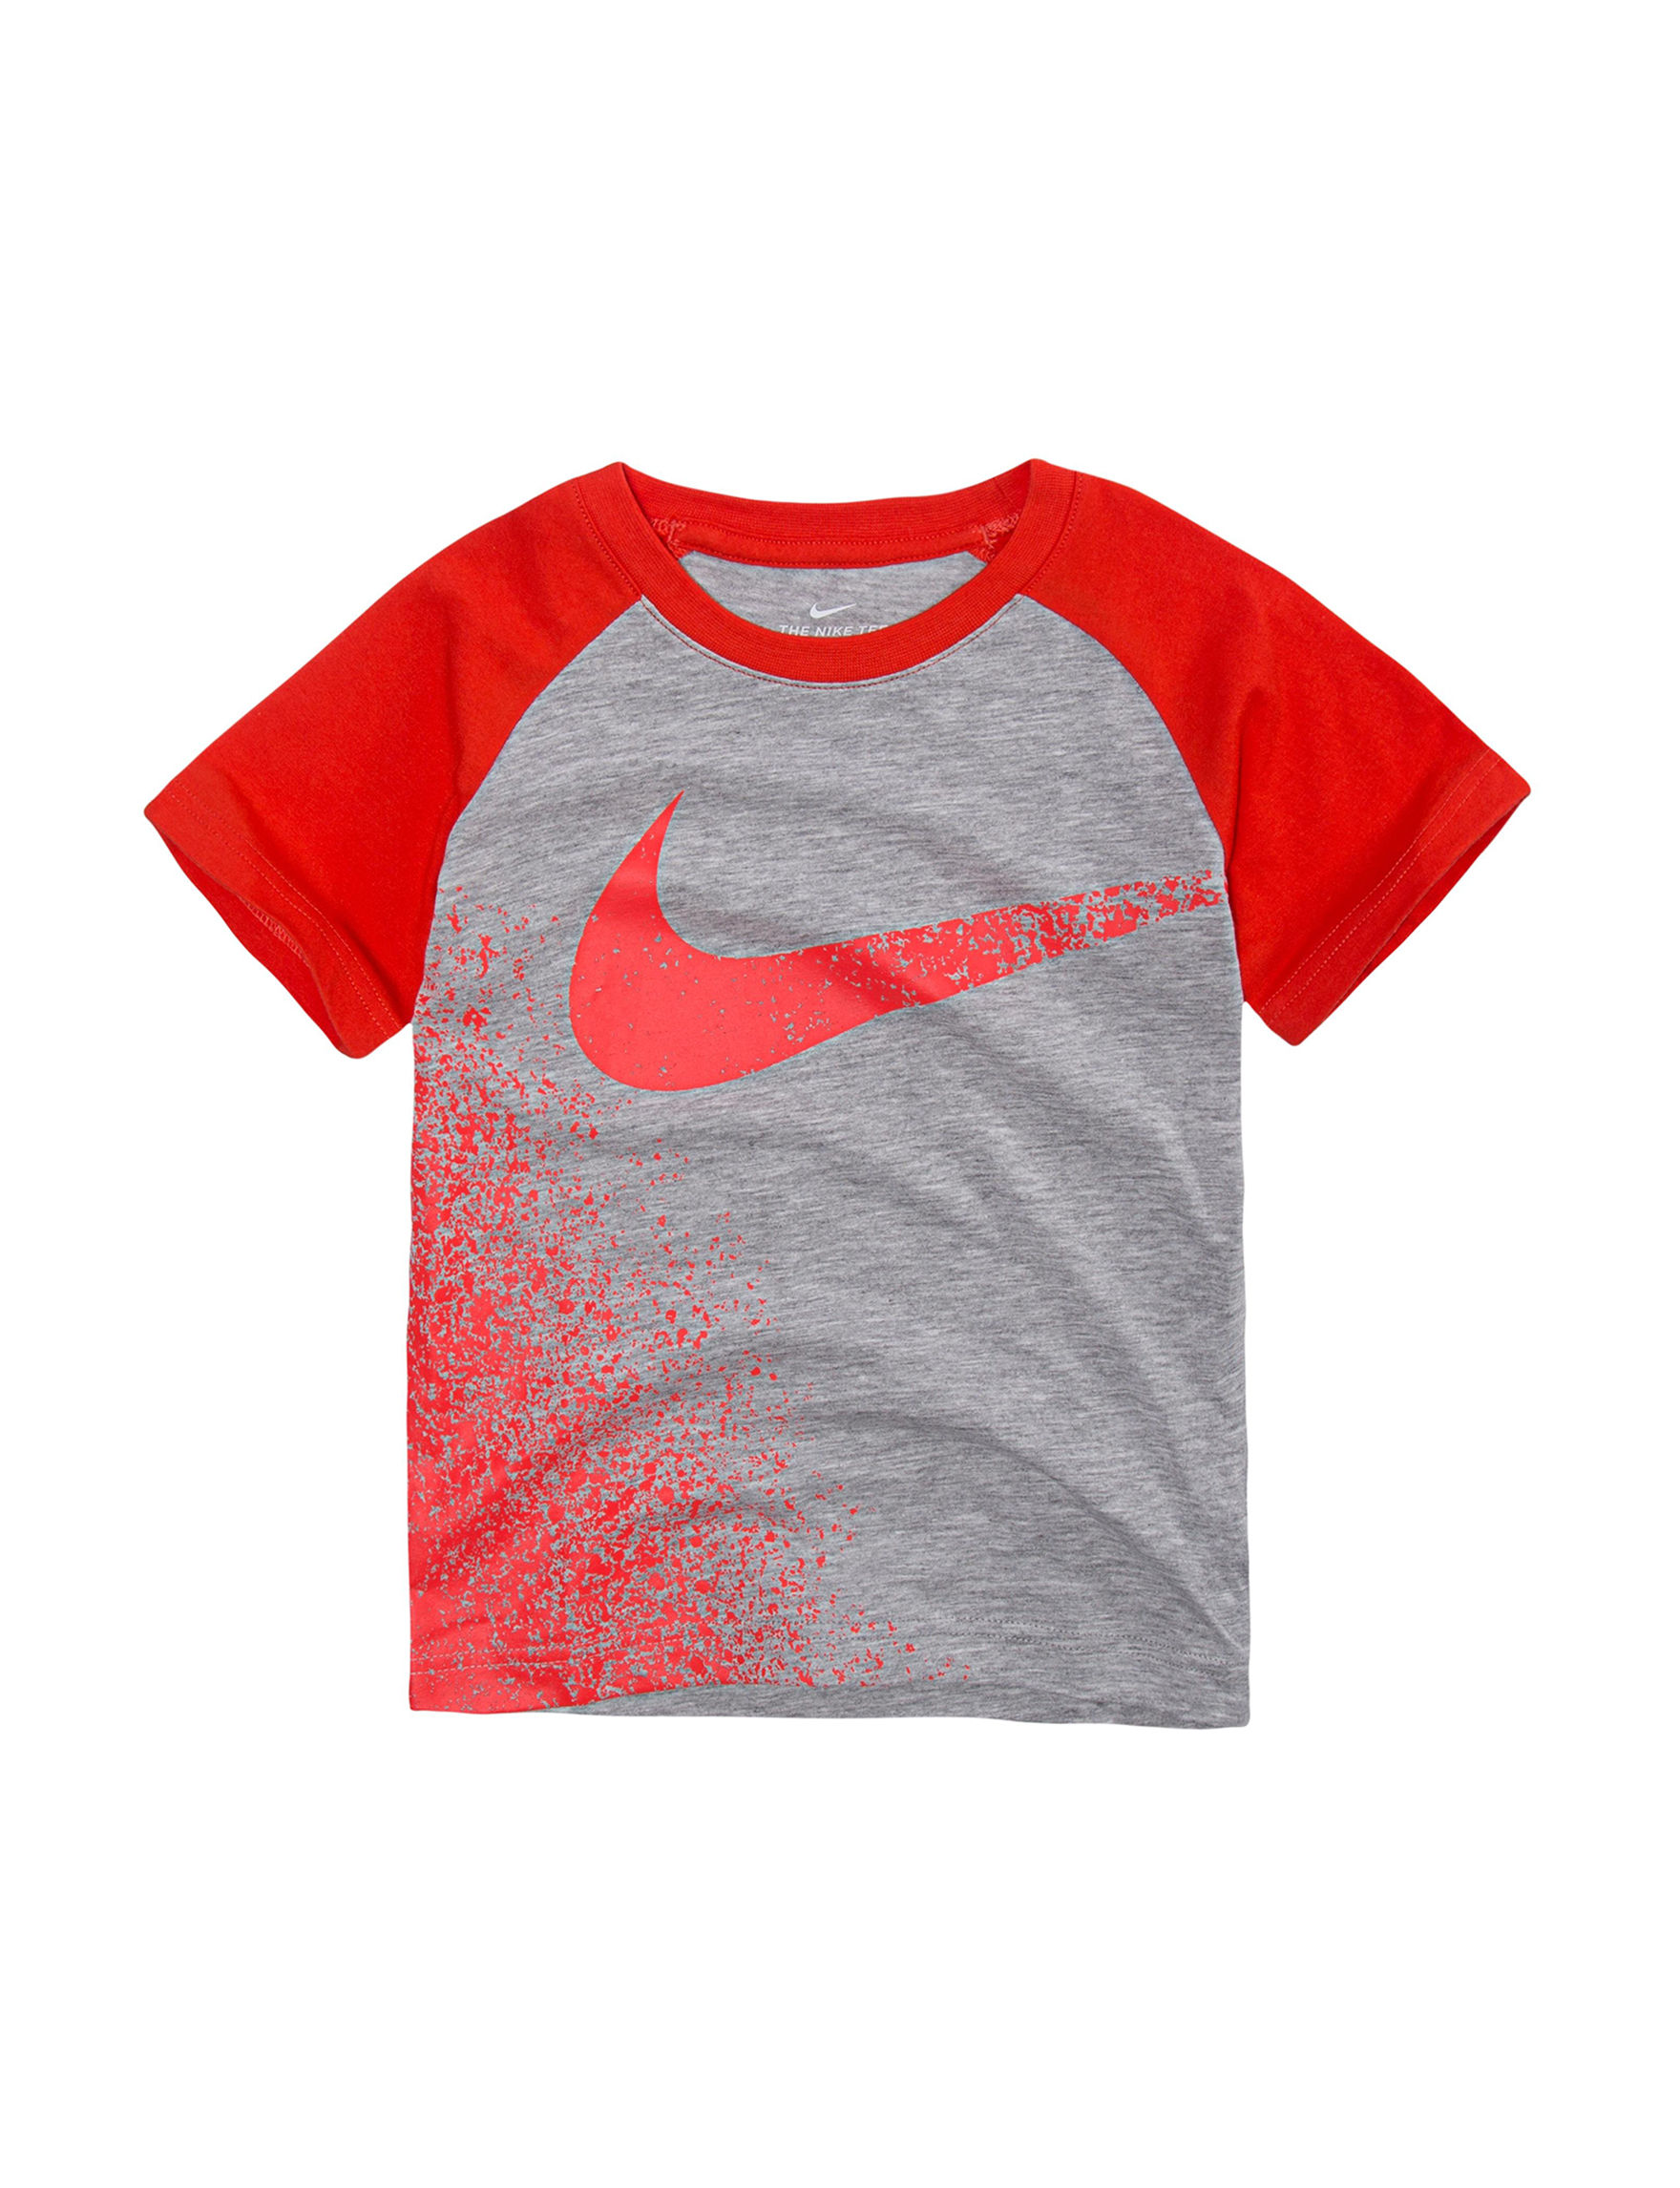 Nike Grey / Red Tees & Tanks